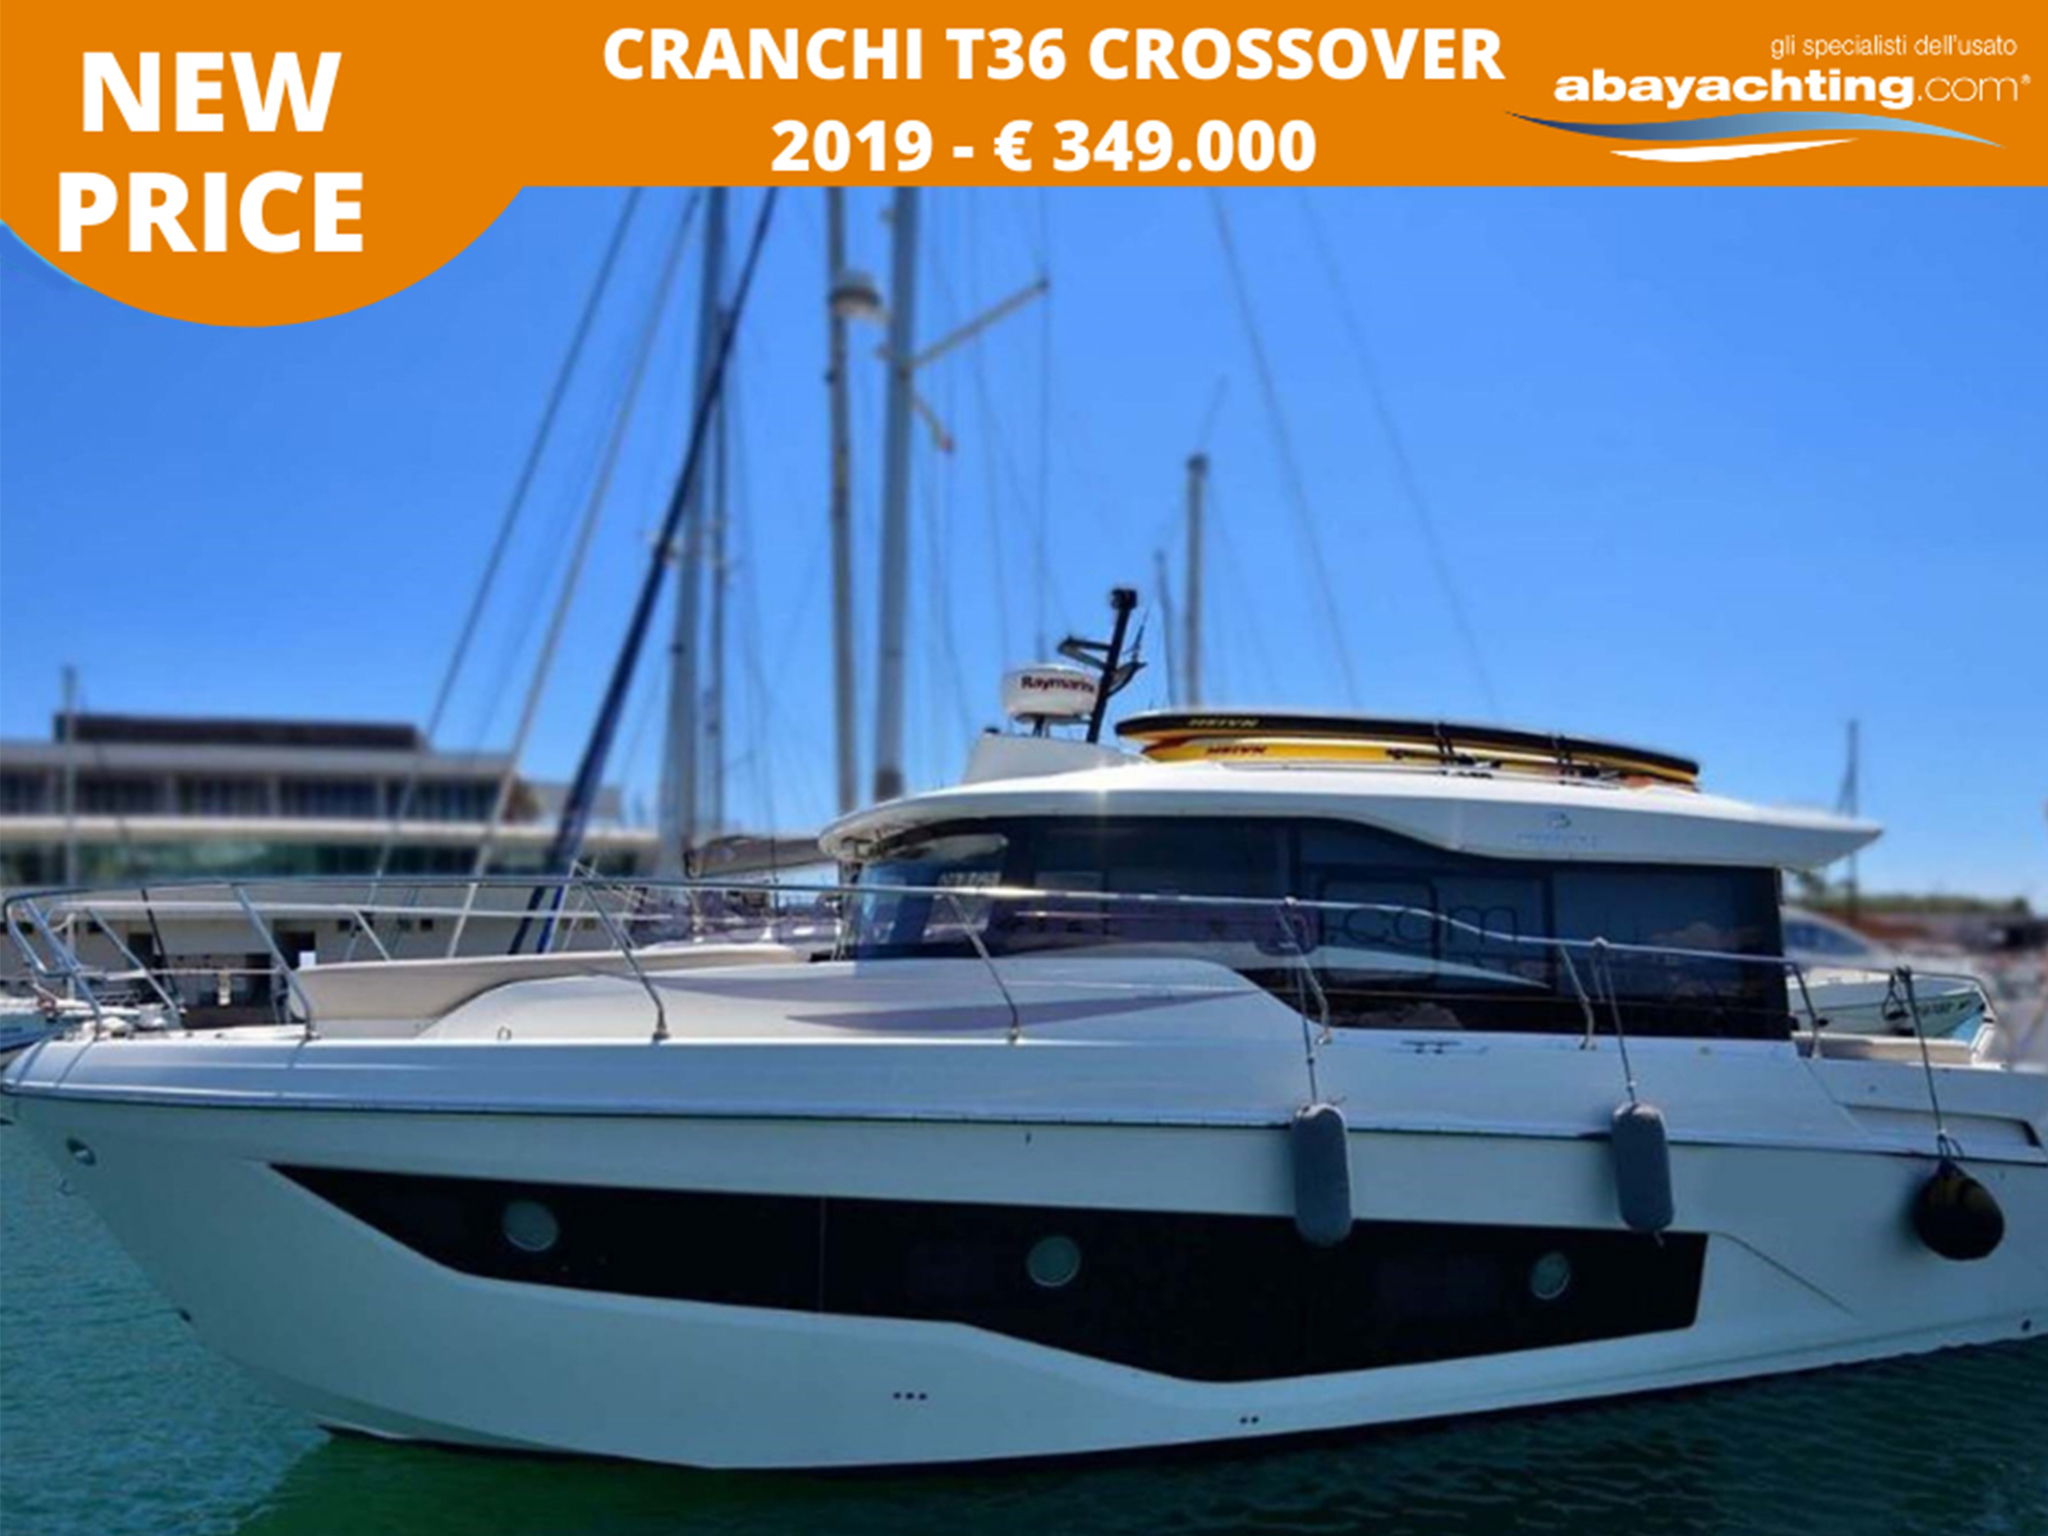 Price reduction Cranchi T36 Crossover